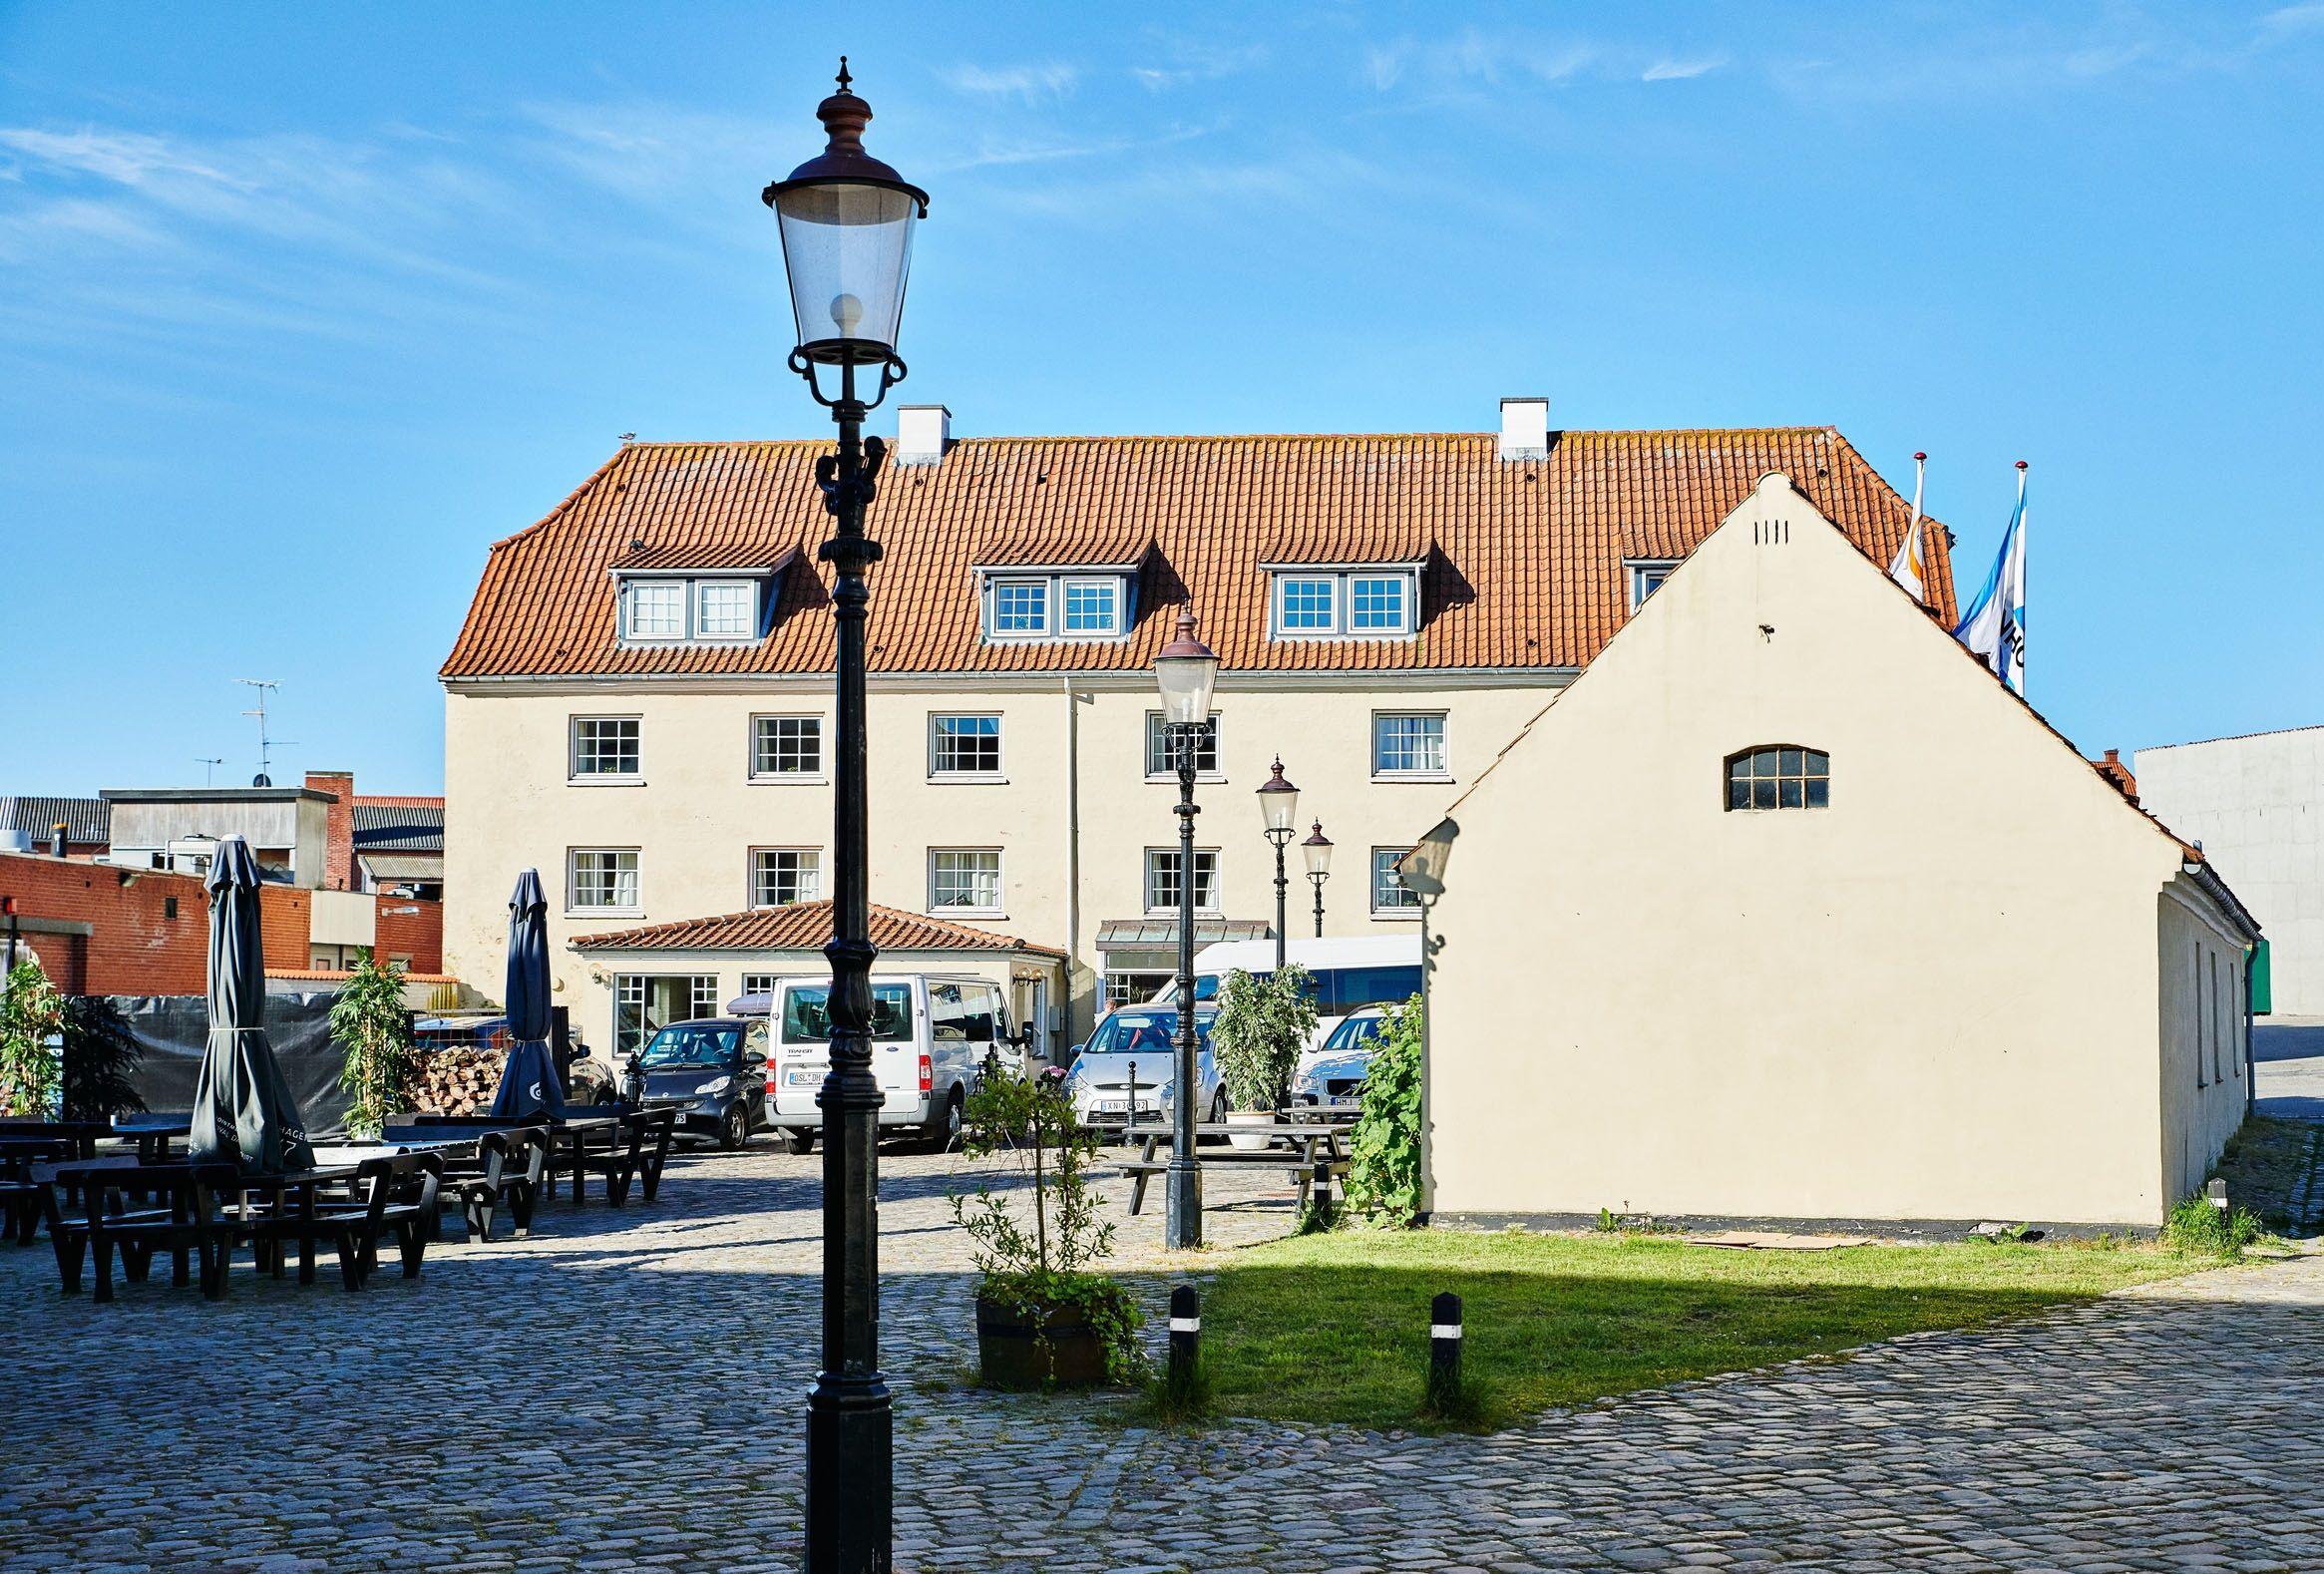 Danhostel Frederikshavn City er blandt de otte danske hoteller der er krakket under coronakrisen. Arkivfoto.